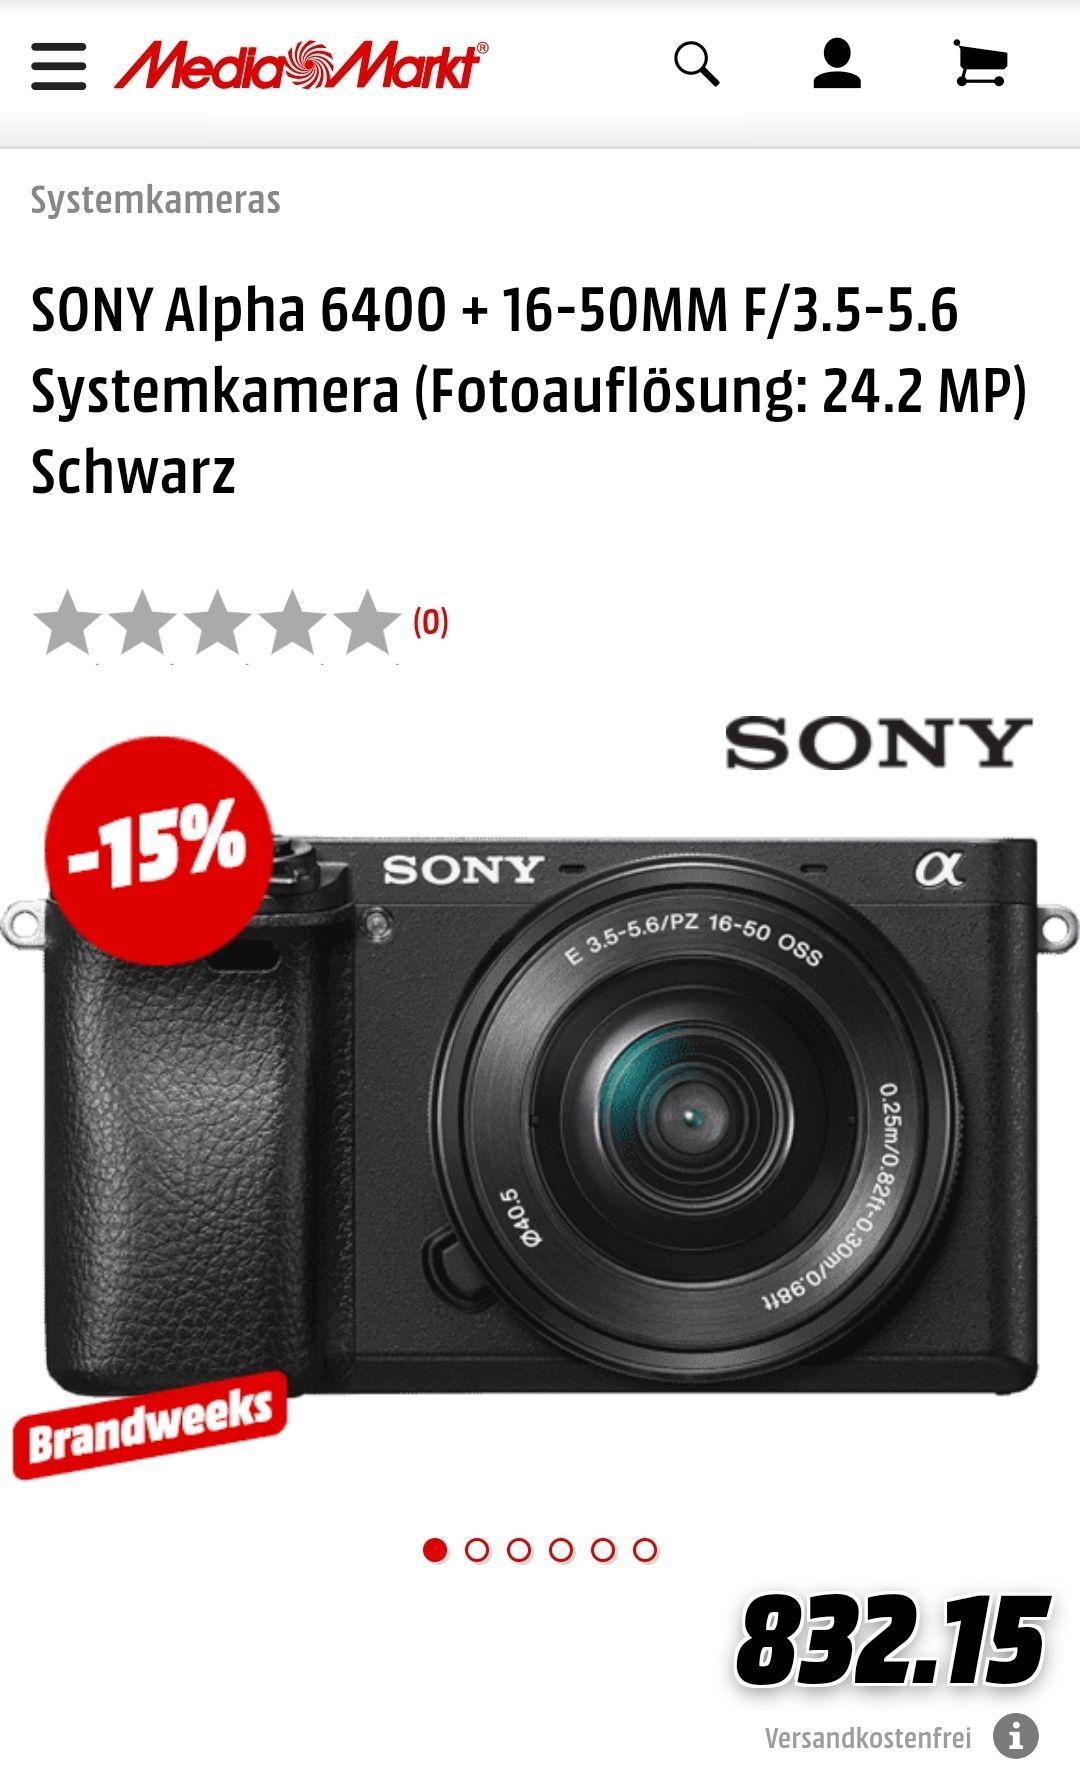 [Schweiz lokal, Mediamarkt.ch] SONY Alpha 6400 + 16-50MM F/3.5-5.6 Systemkamera